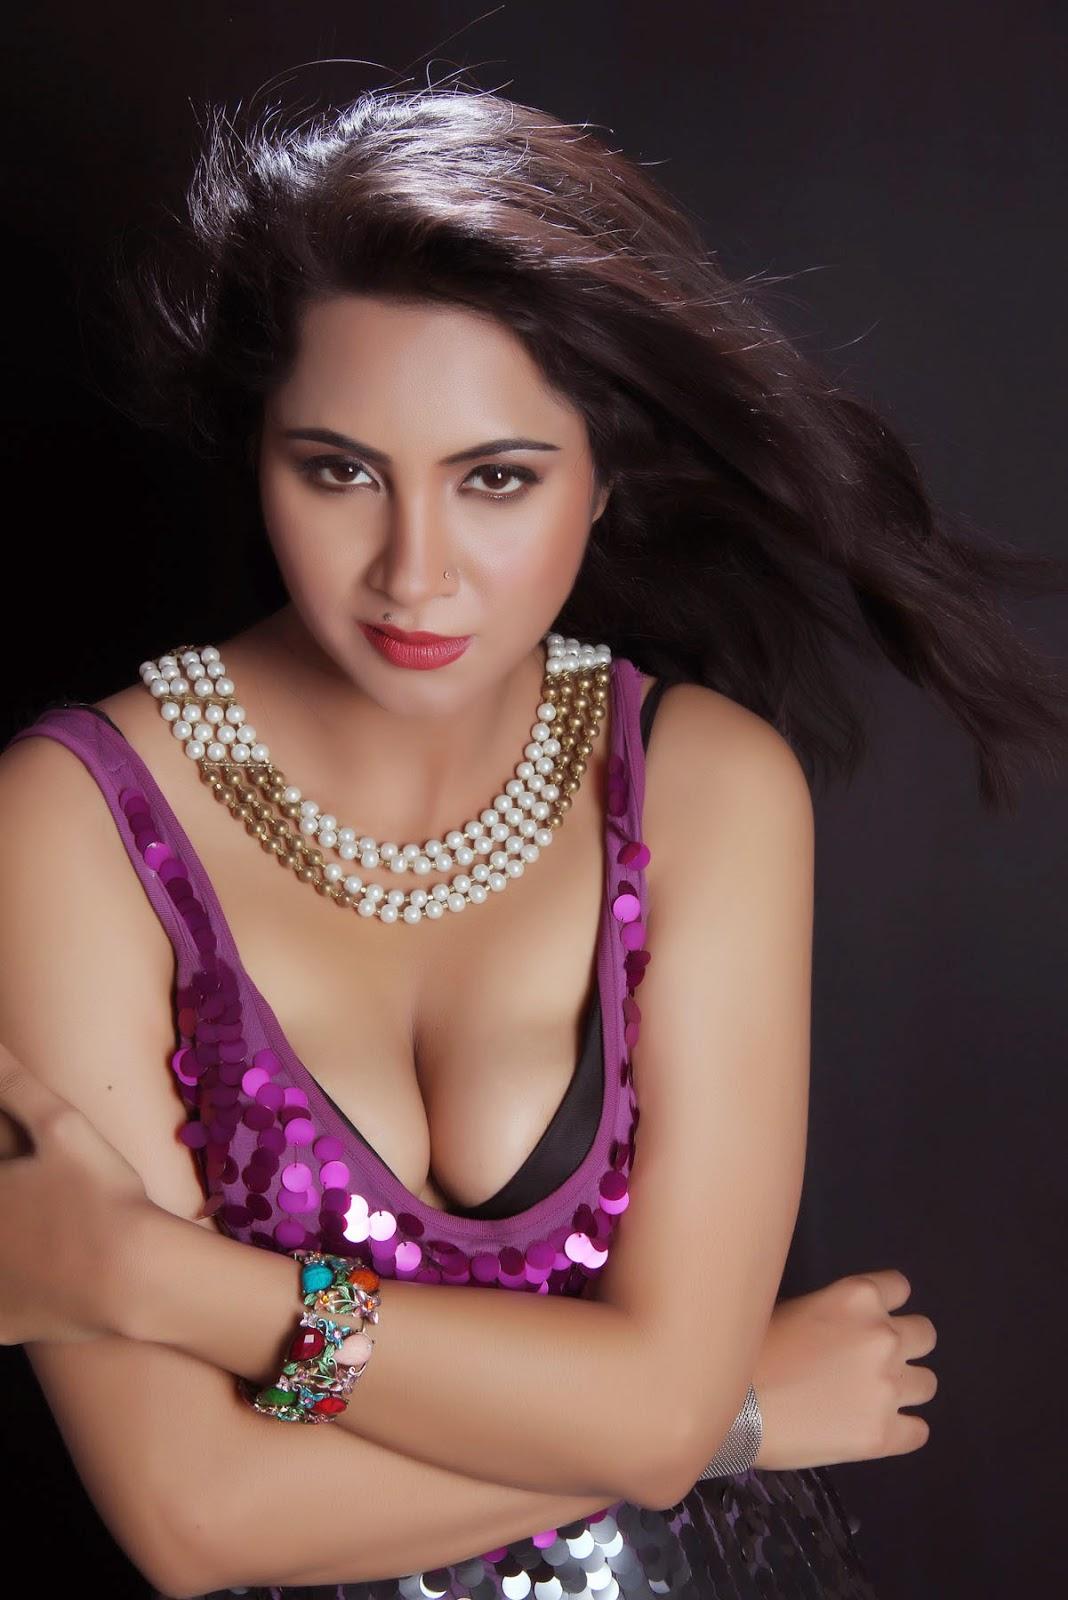 Arshi Khan hot photos